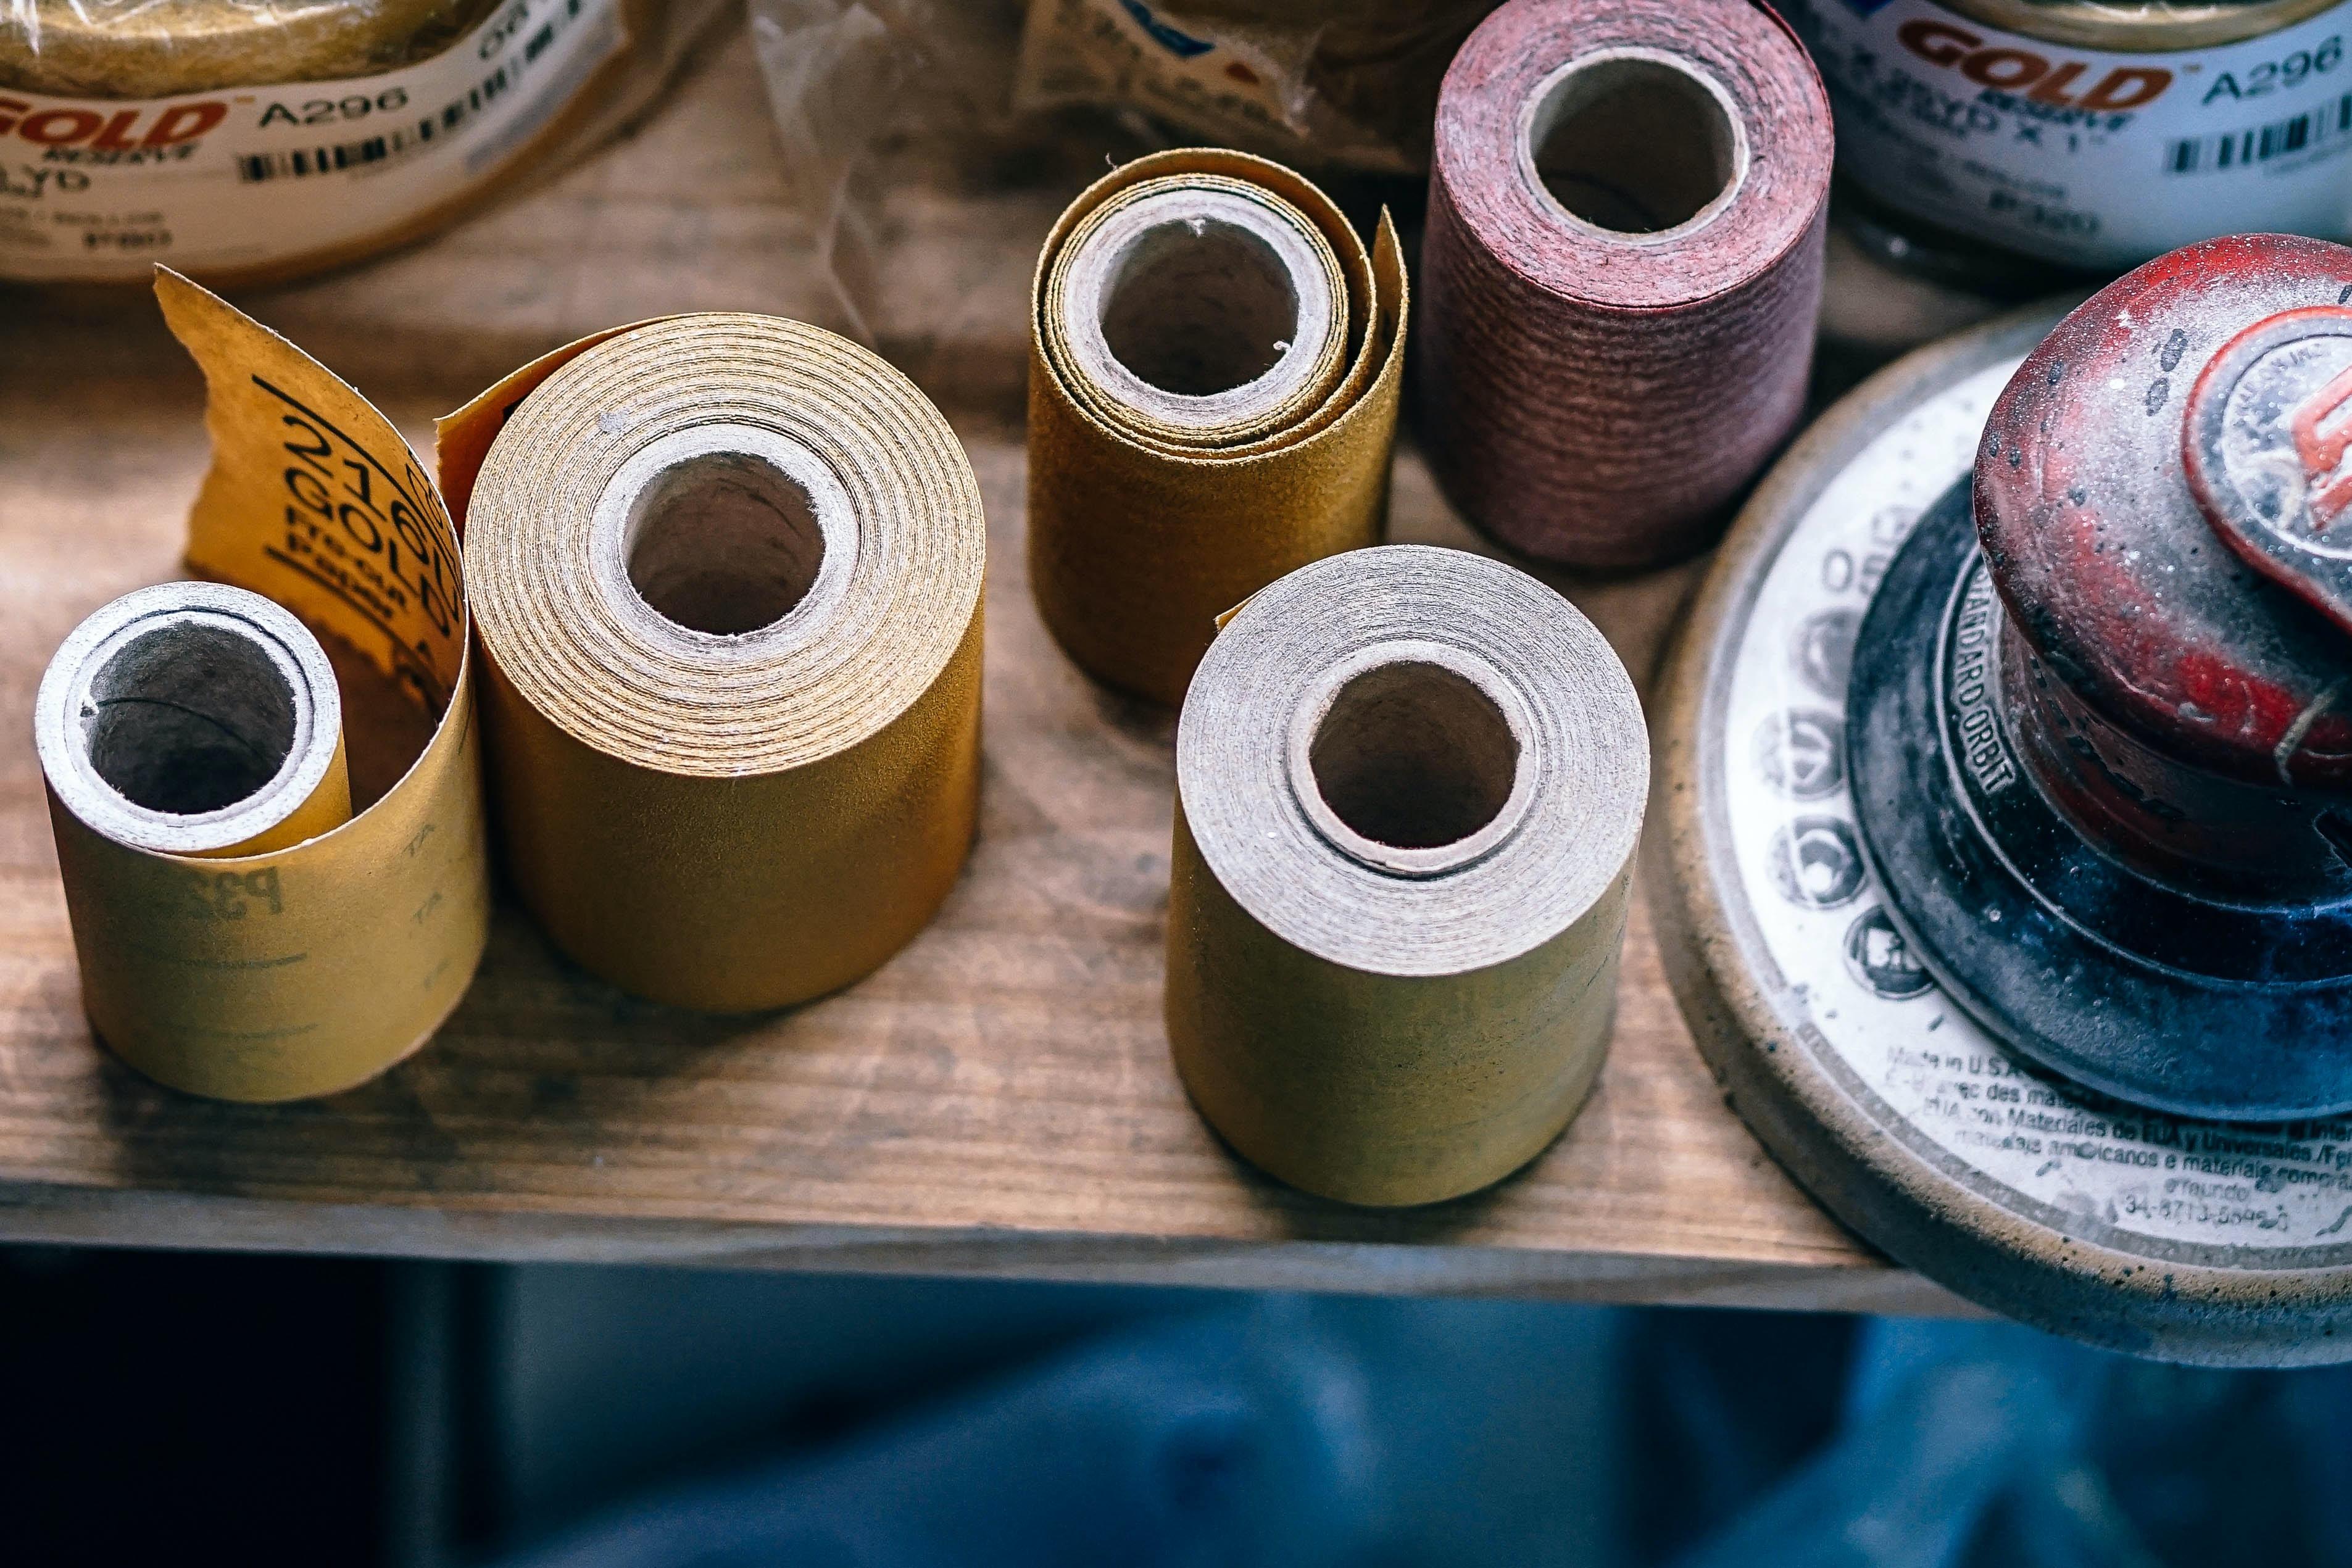 several assorted-colored sandpaper rolls